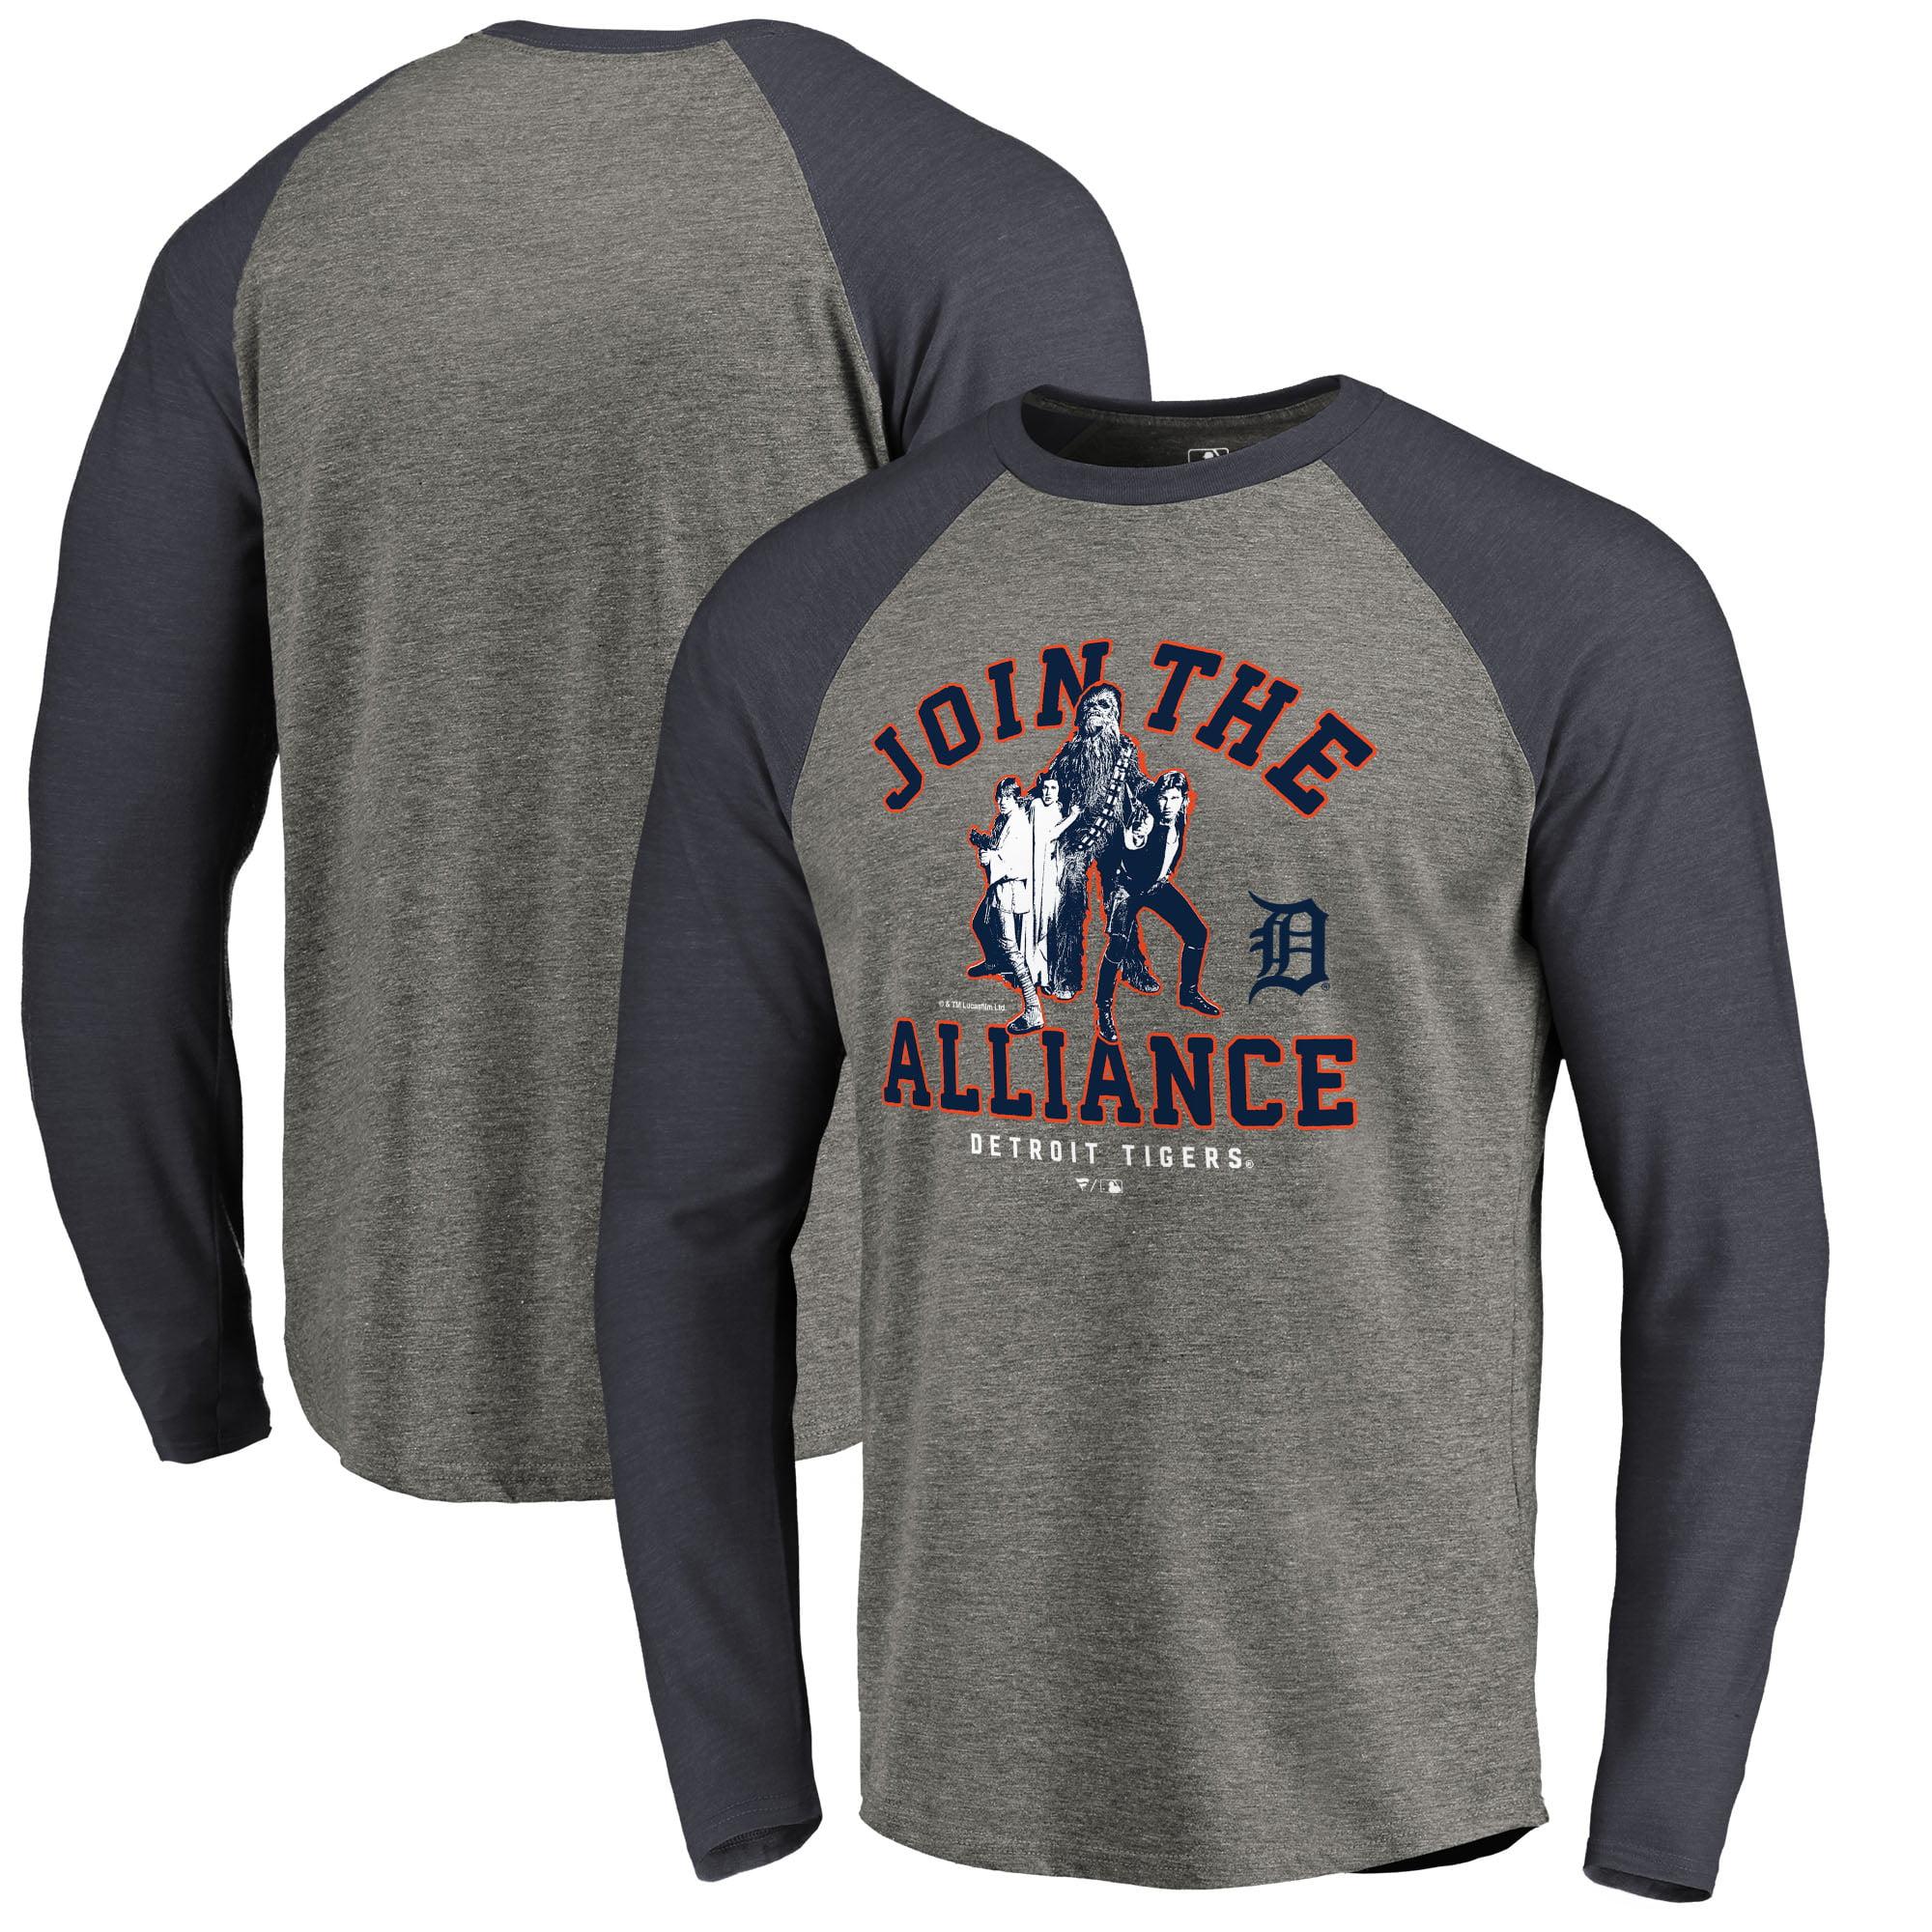 Detroit Tigers Fanatics Branded MLB Star Wars Join The Alliance Raglan Long Sleeve T-Shirt - Heather Gray